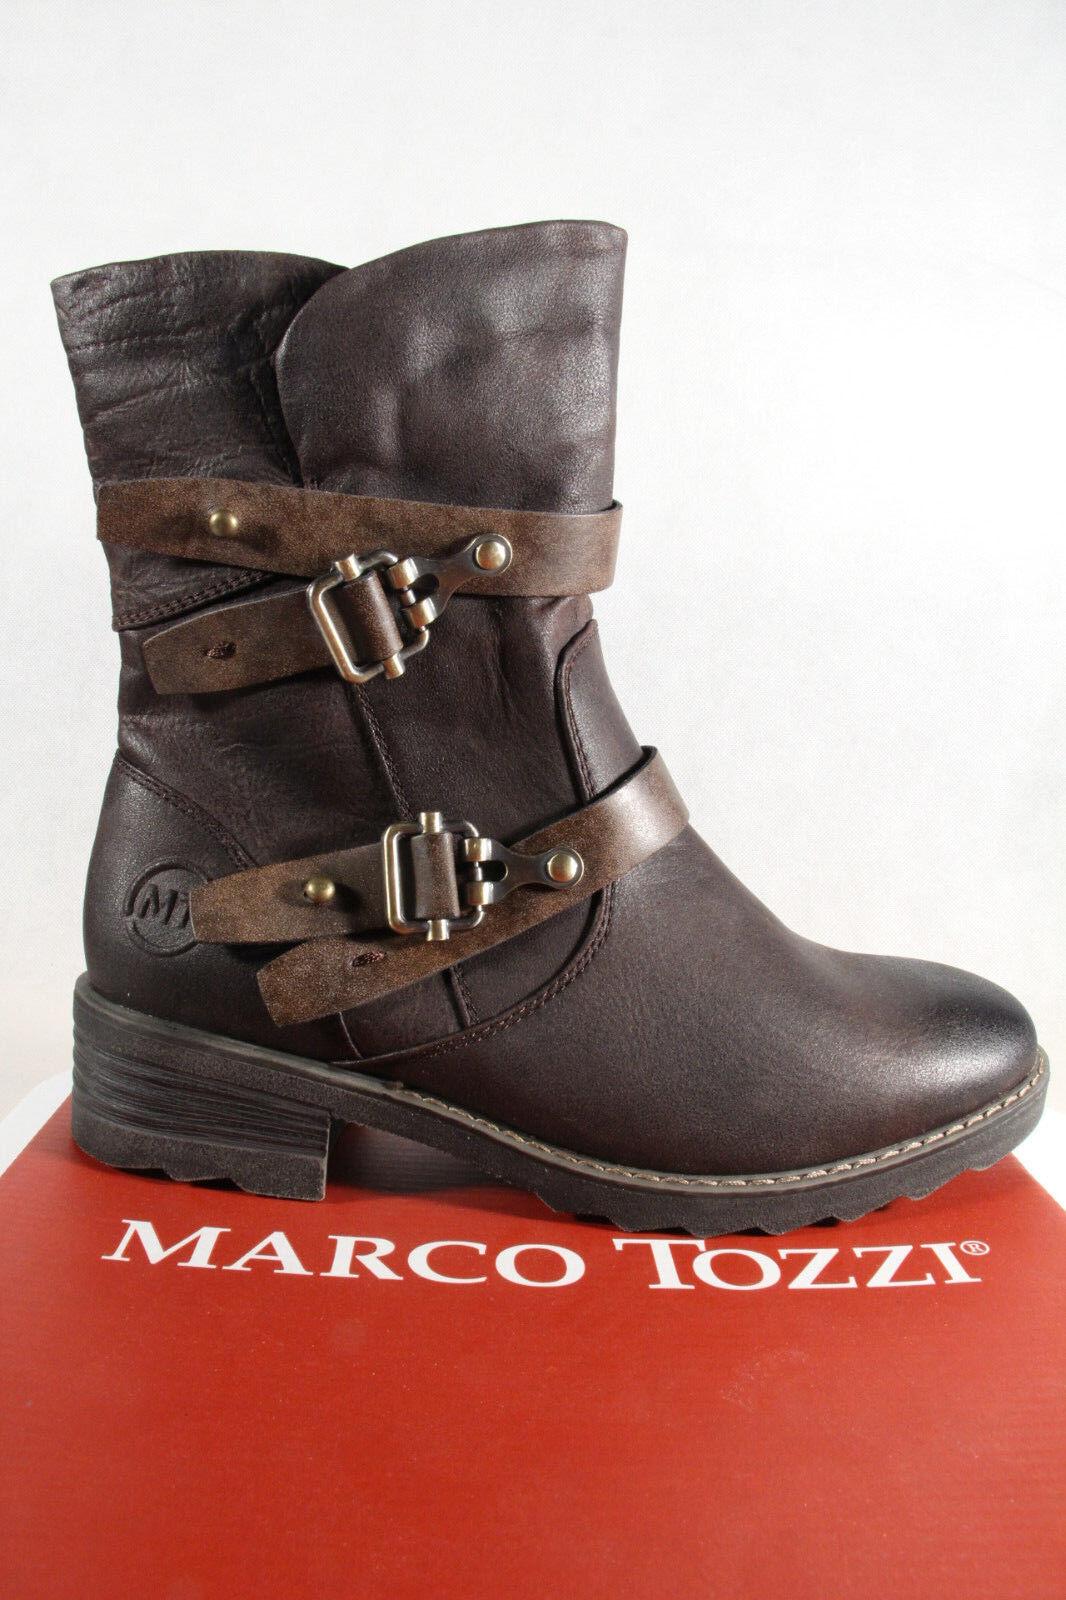 marco tozzi bottes, bottines, Marron , 26432 doublure nouvelle doublure 26432 chaude, rv 83ab44